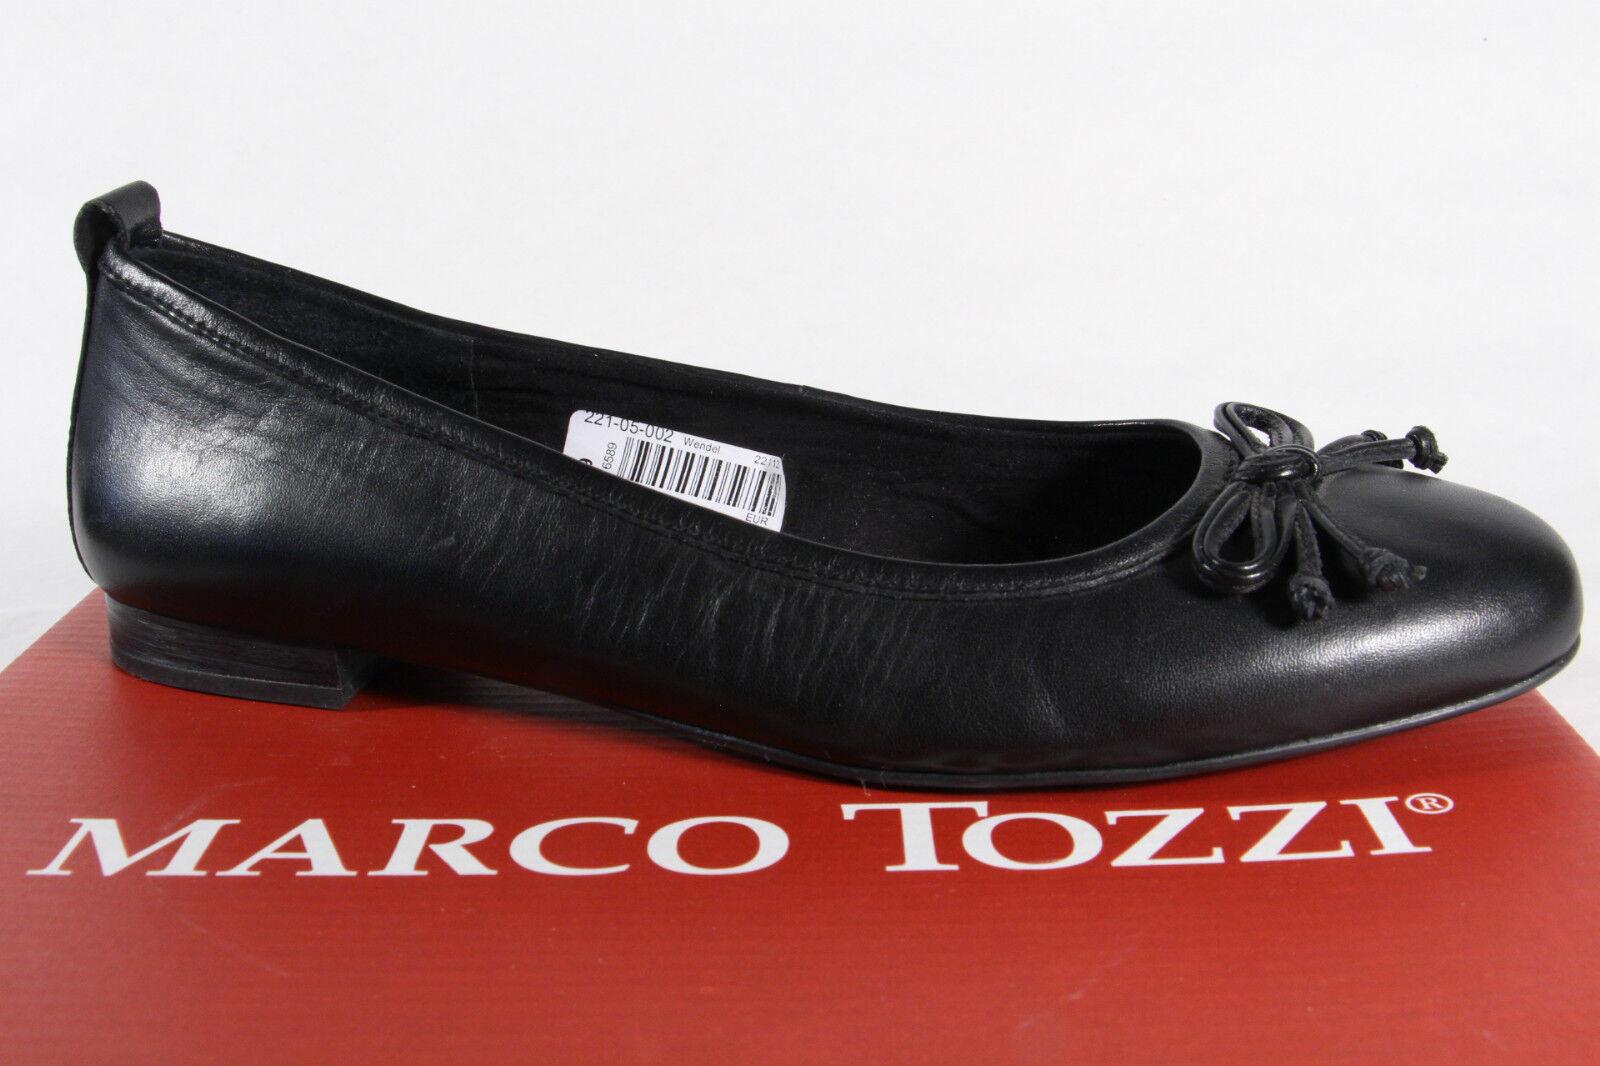 Marco schwarz Tozzi Slipper Ballerina Pumps schwarz Marco Echtleder, weiche Innensohle NEU f97dd9